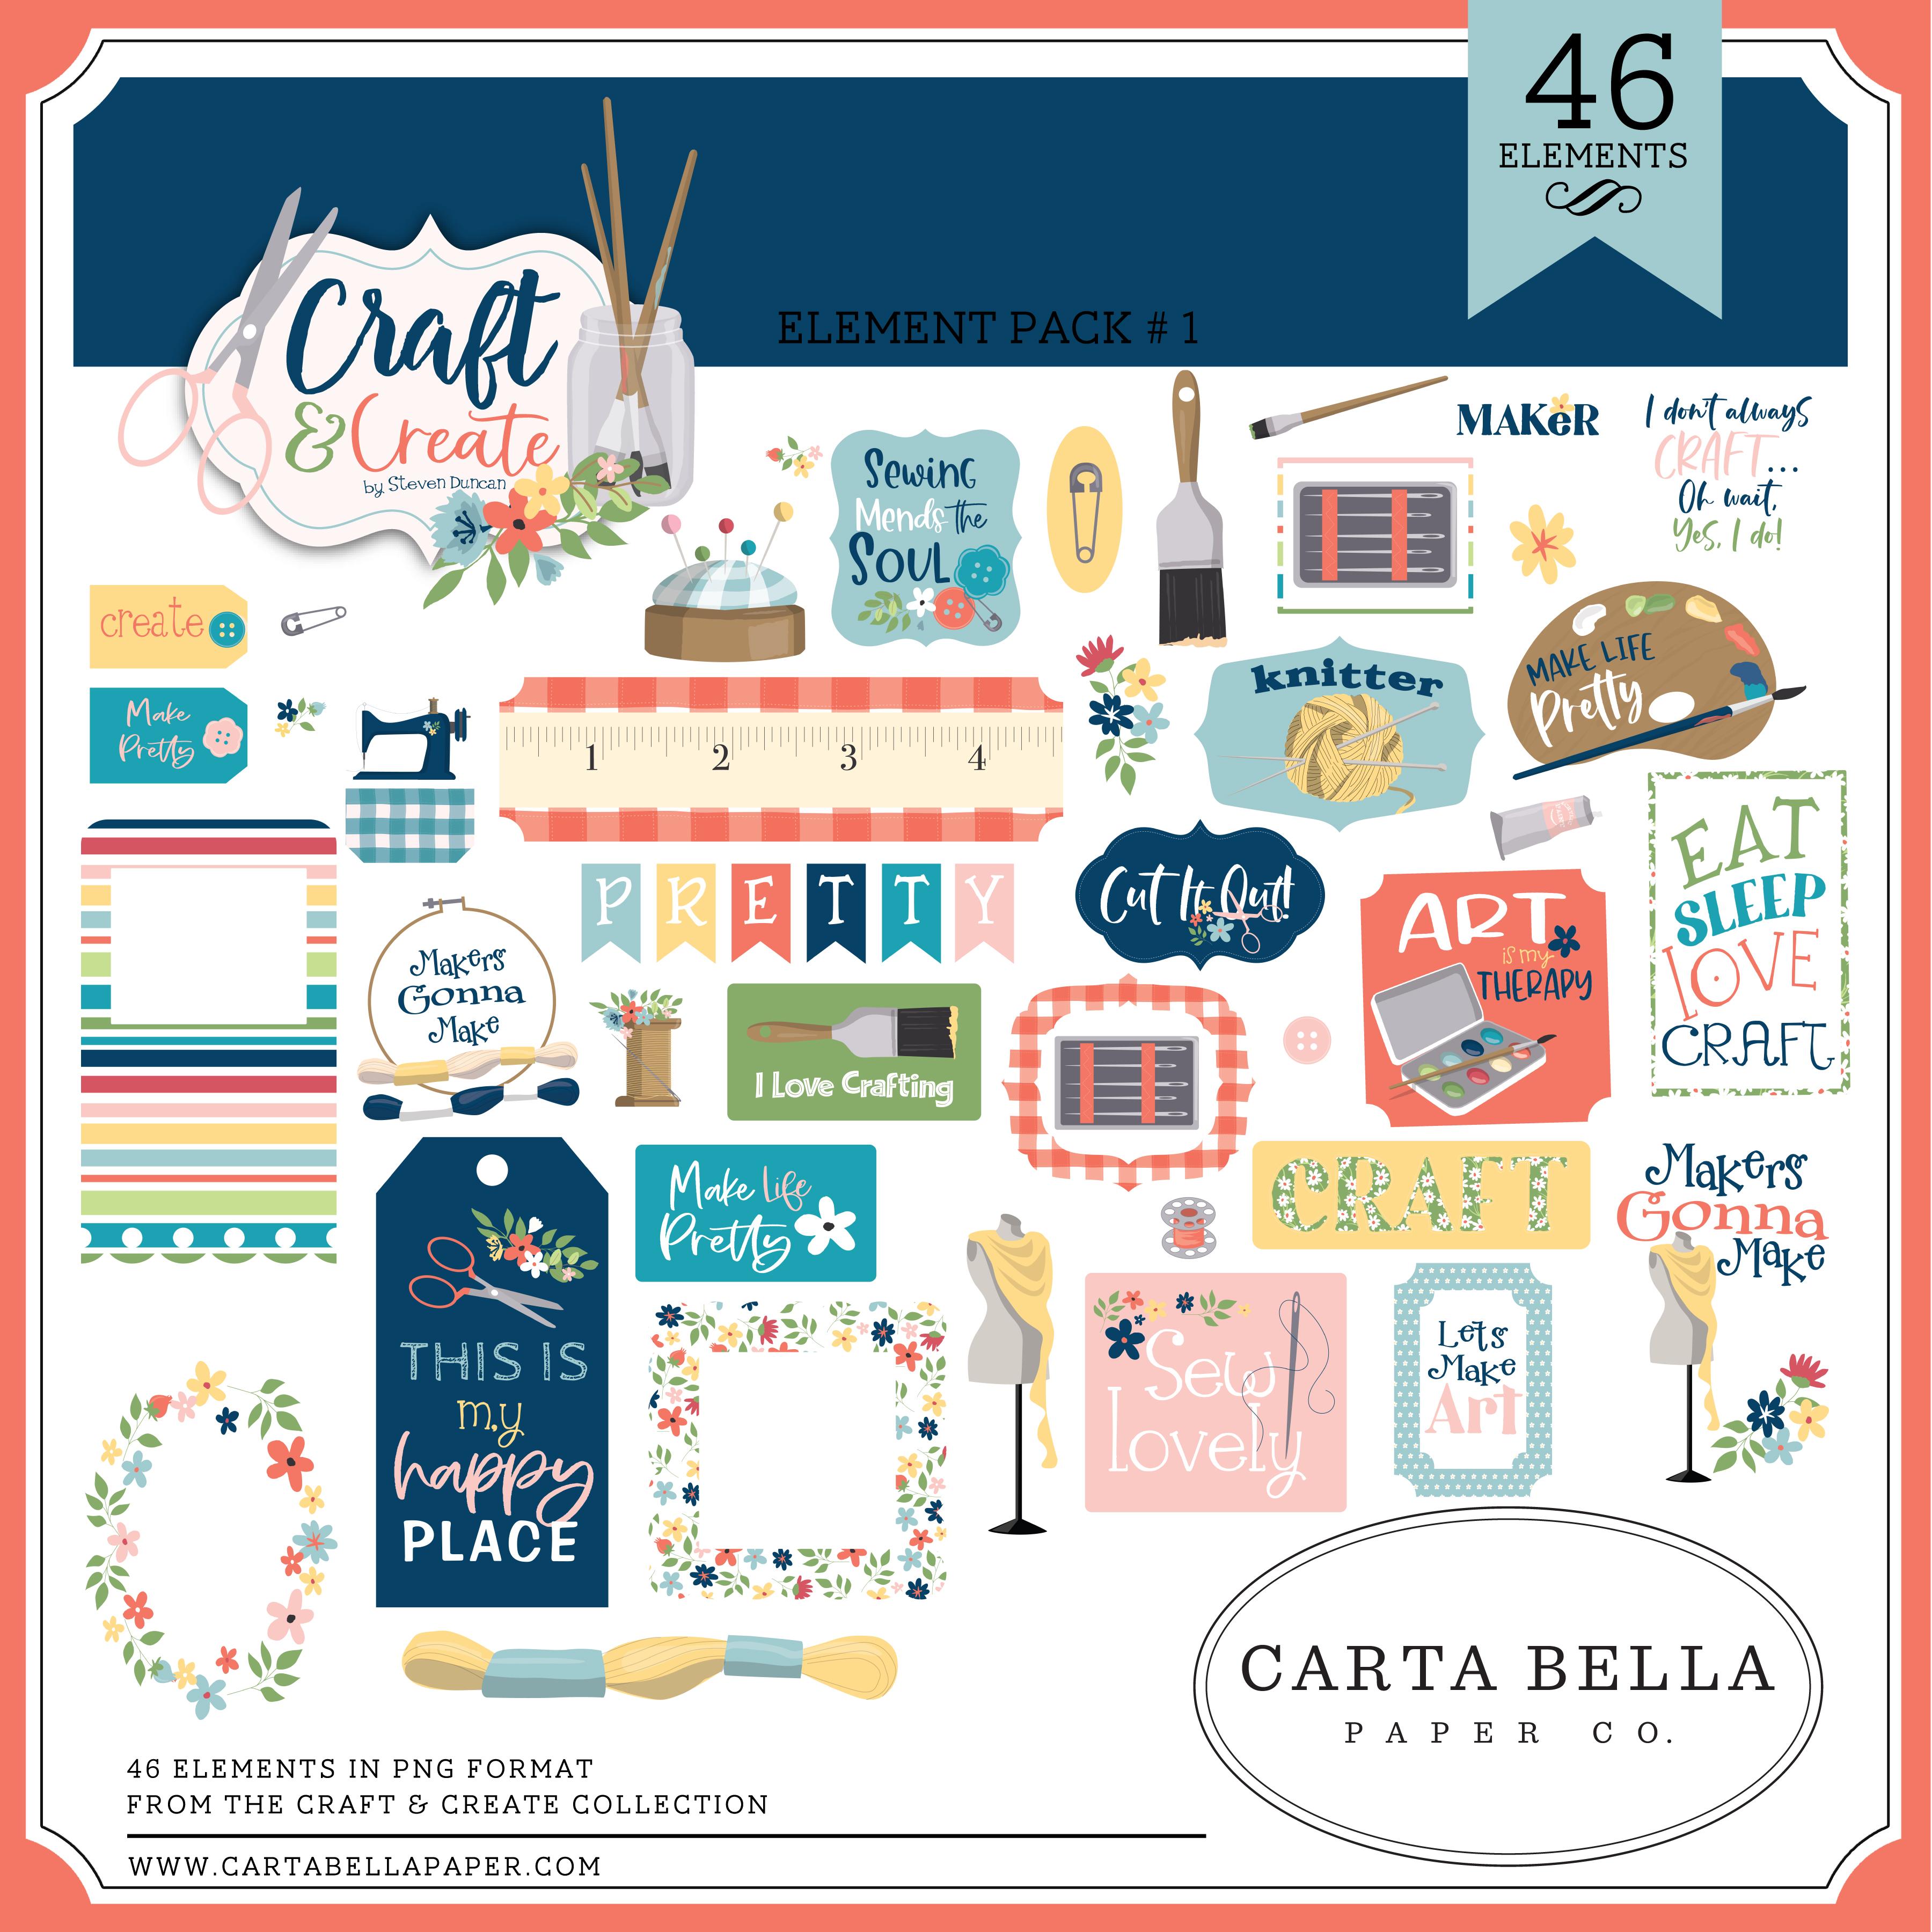 Craft & Create Element Pack #1